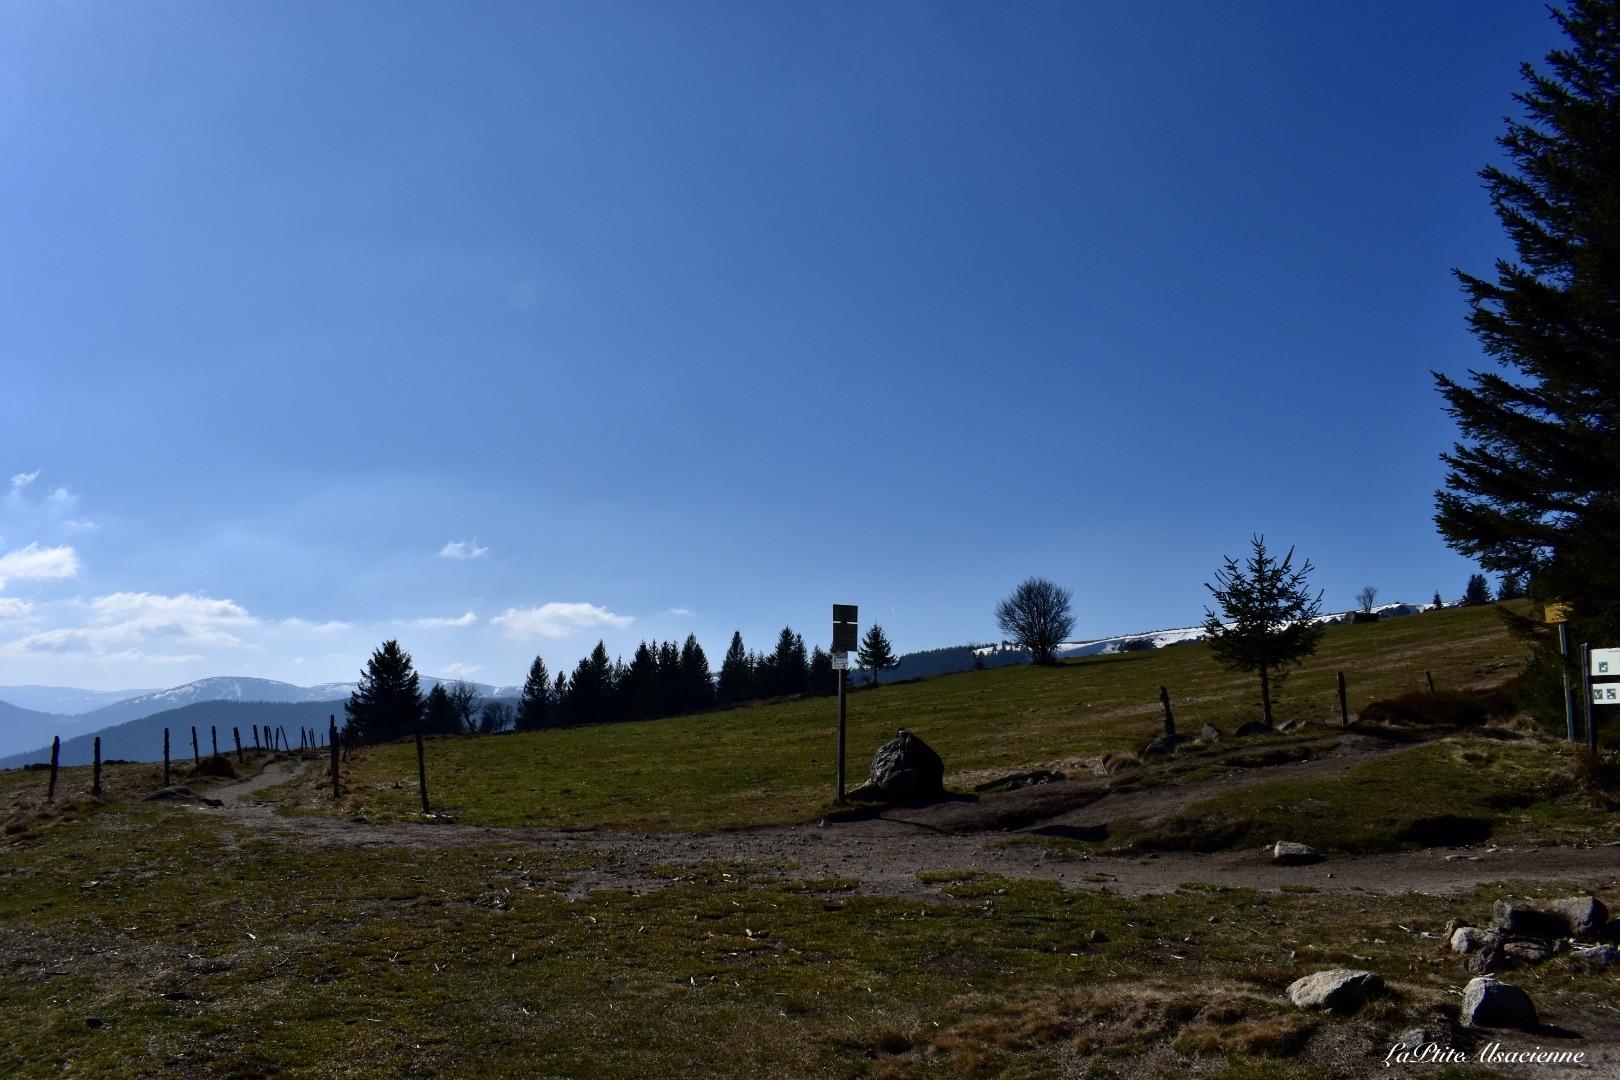 Lieu dit Kraywasen  ou aussi appelé la Quatscha Platzla - alt 1122m